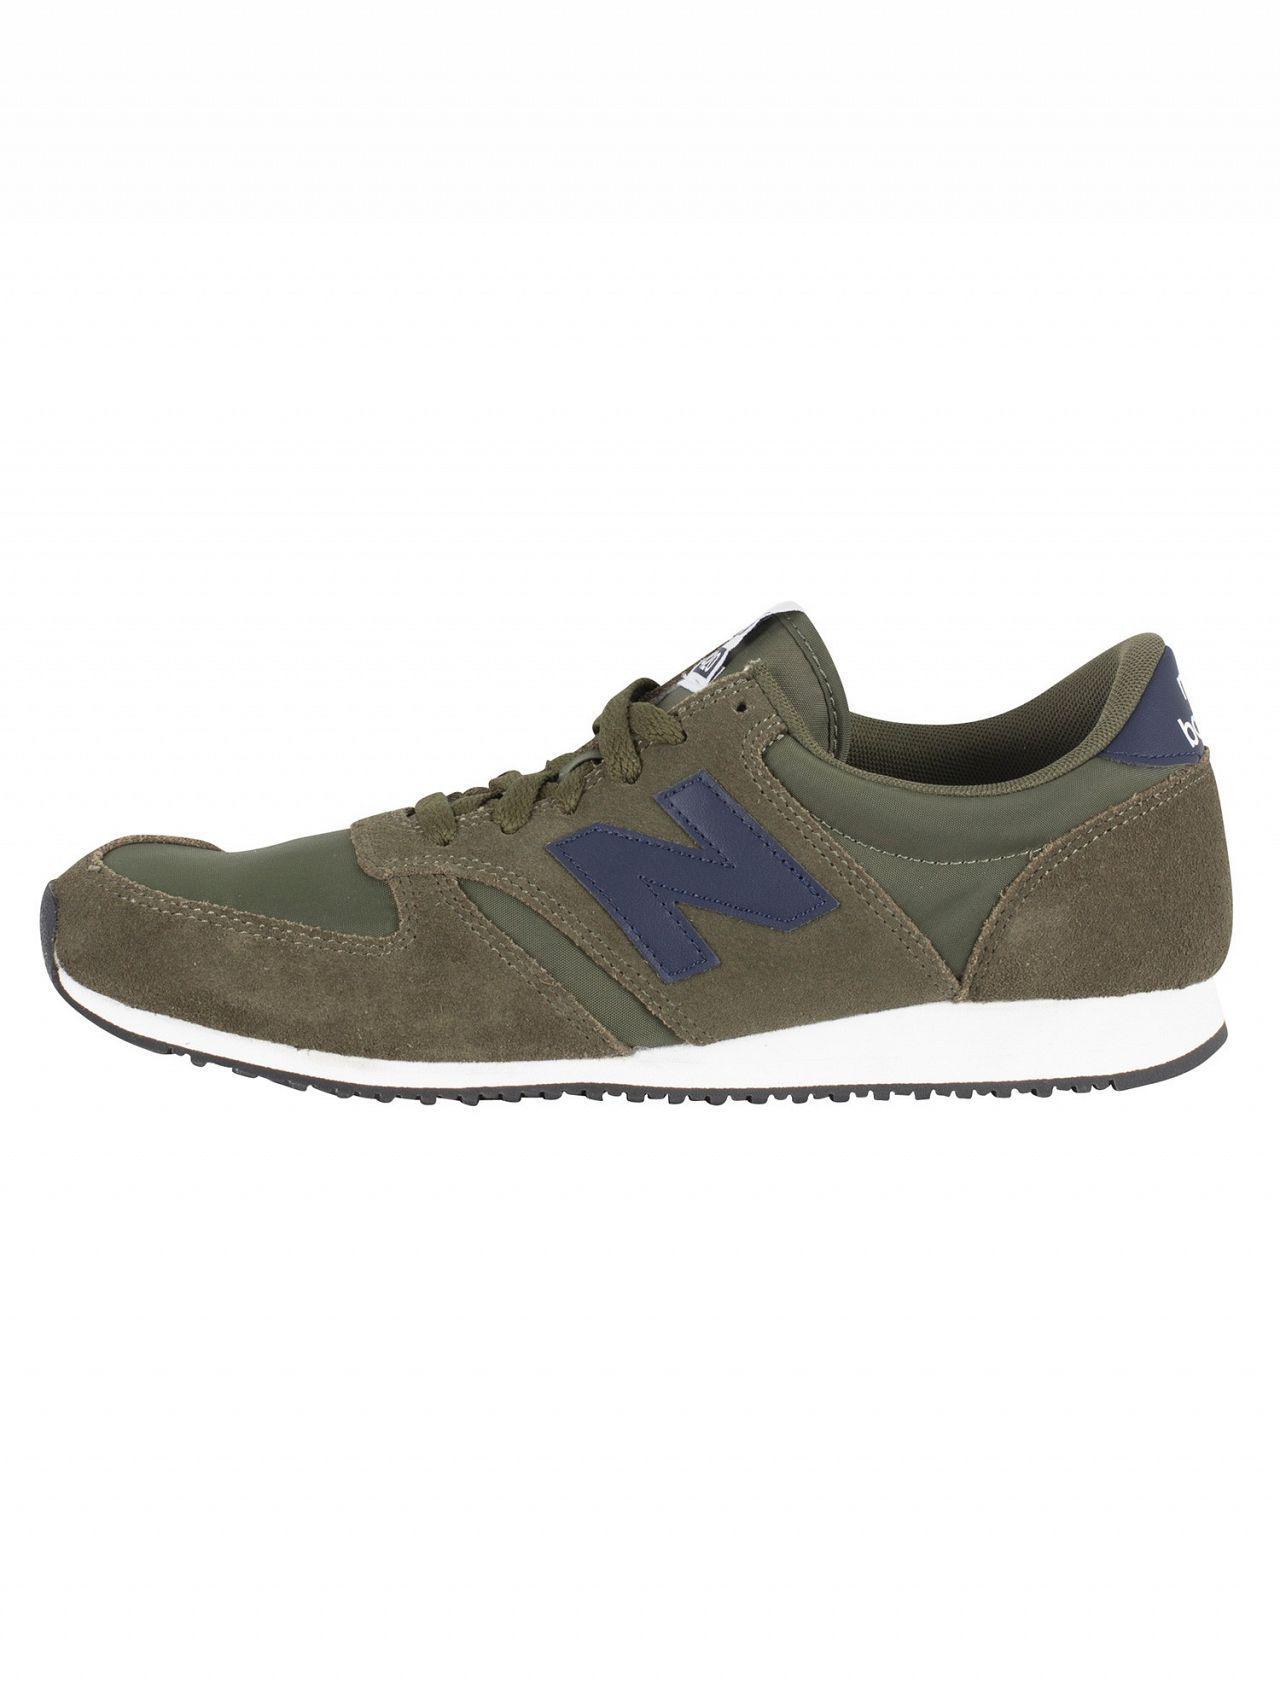 New Balance Covert Green/pigment 420